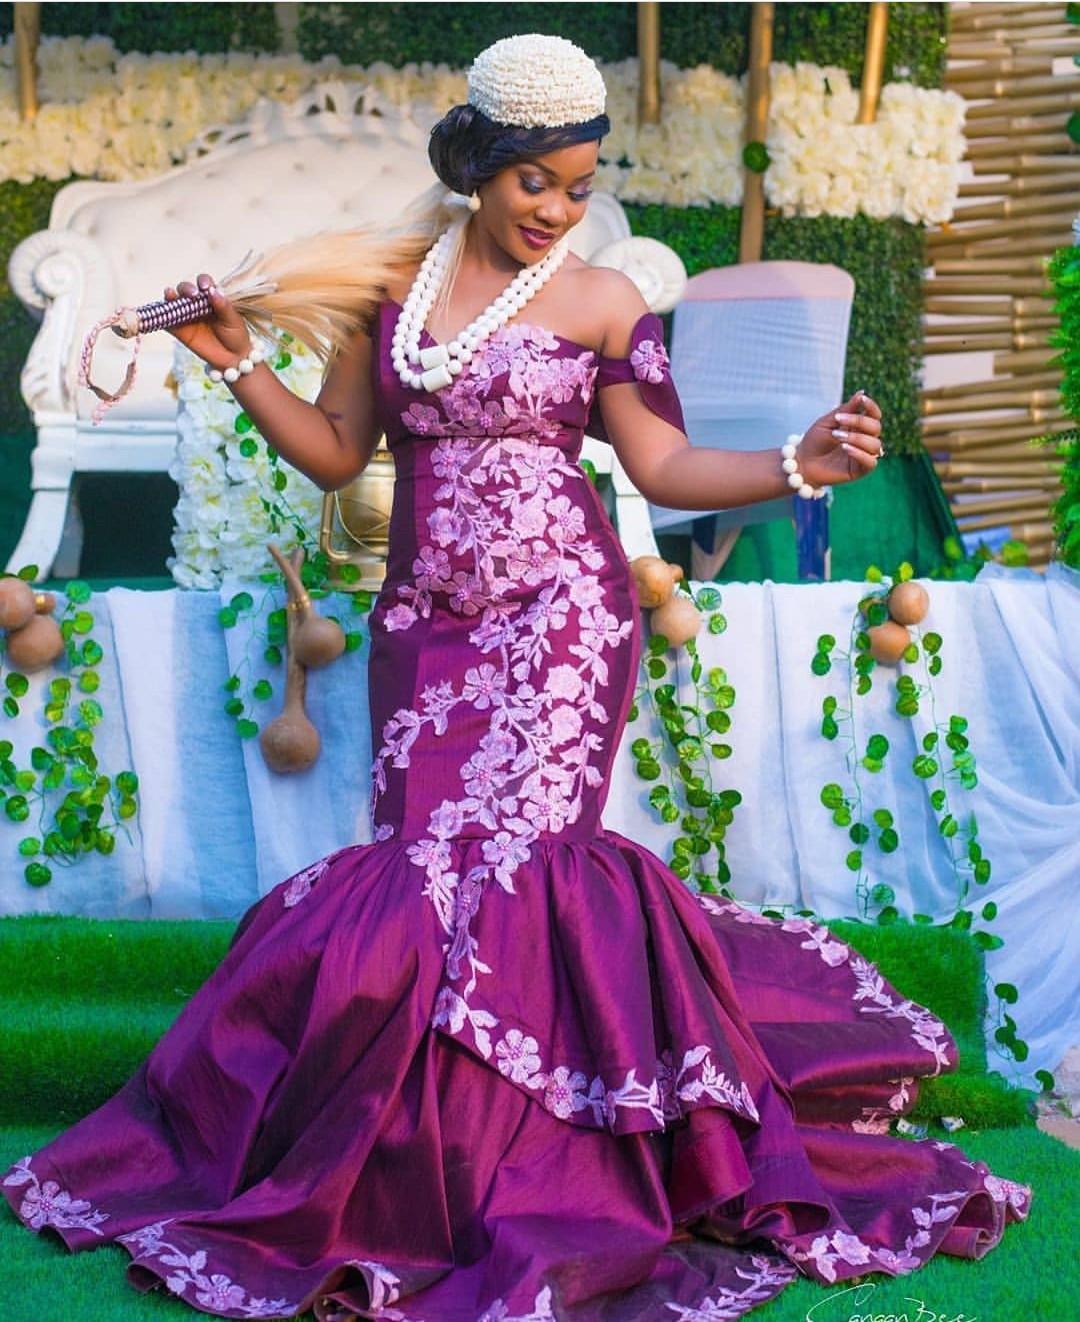 Stylish Wedding Gowns: 2019 TRADITIONAL WEDDING DRESS: GOWNS STYLISH LONG DRESS